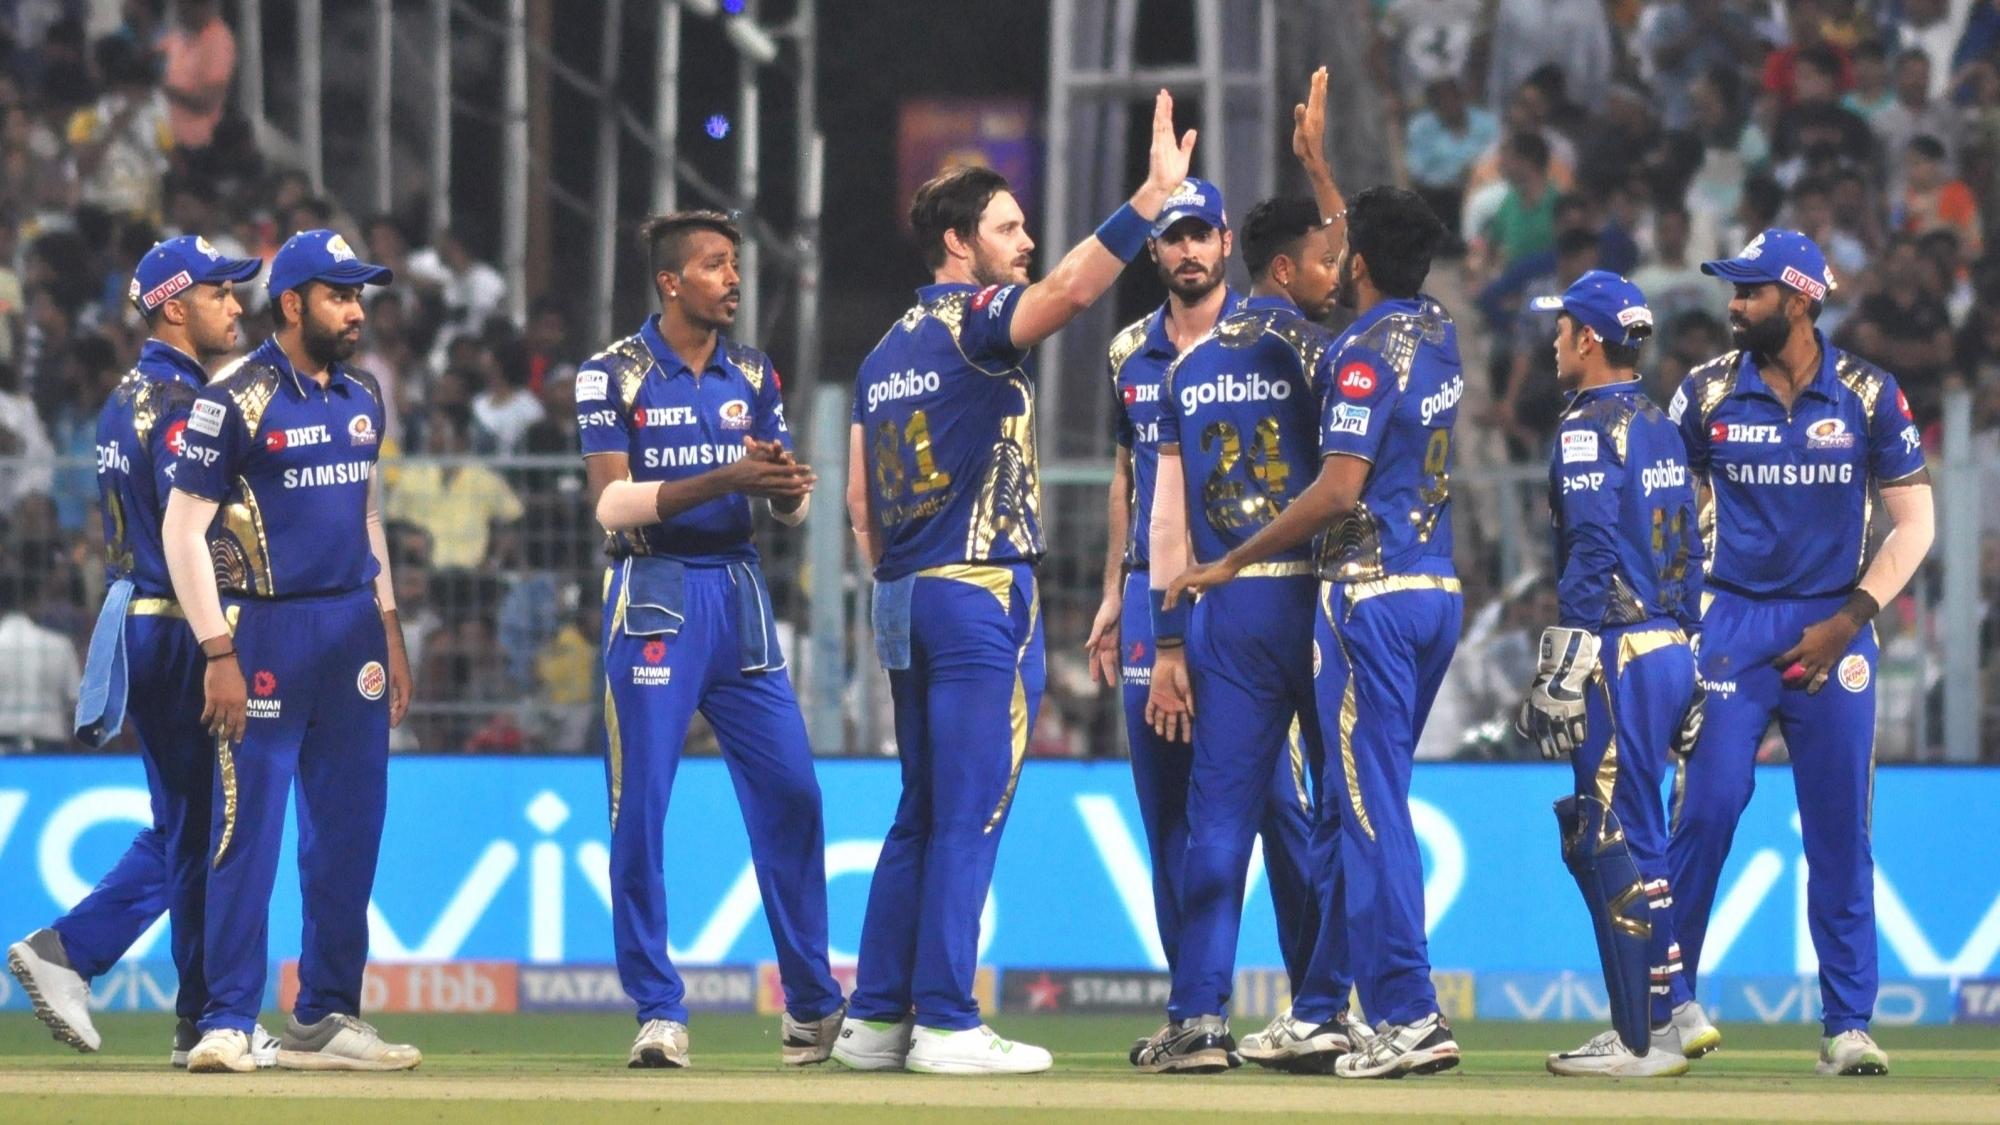 IPL 2018: KKRvMI- मुंबई इंडियंस ने 102 रनों से दी कोलकाता नाइटराइडर्स को मात